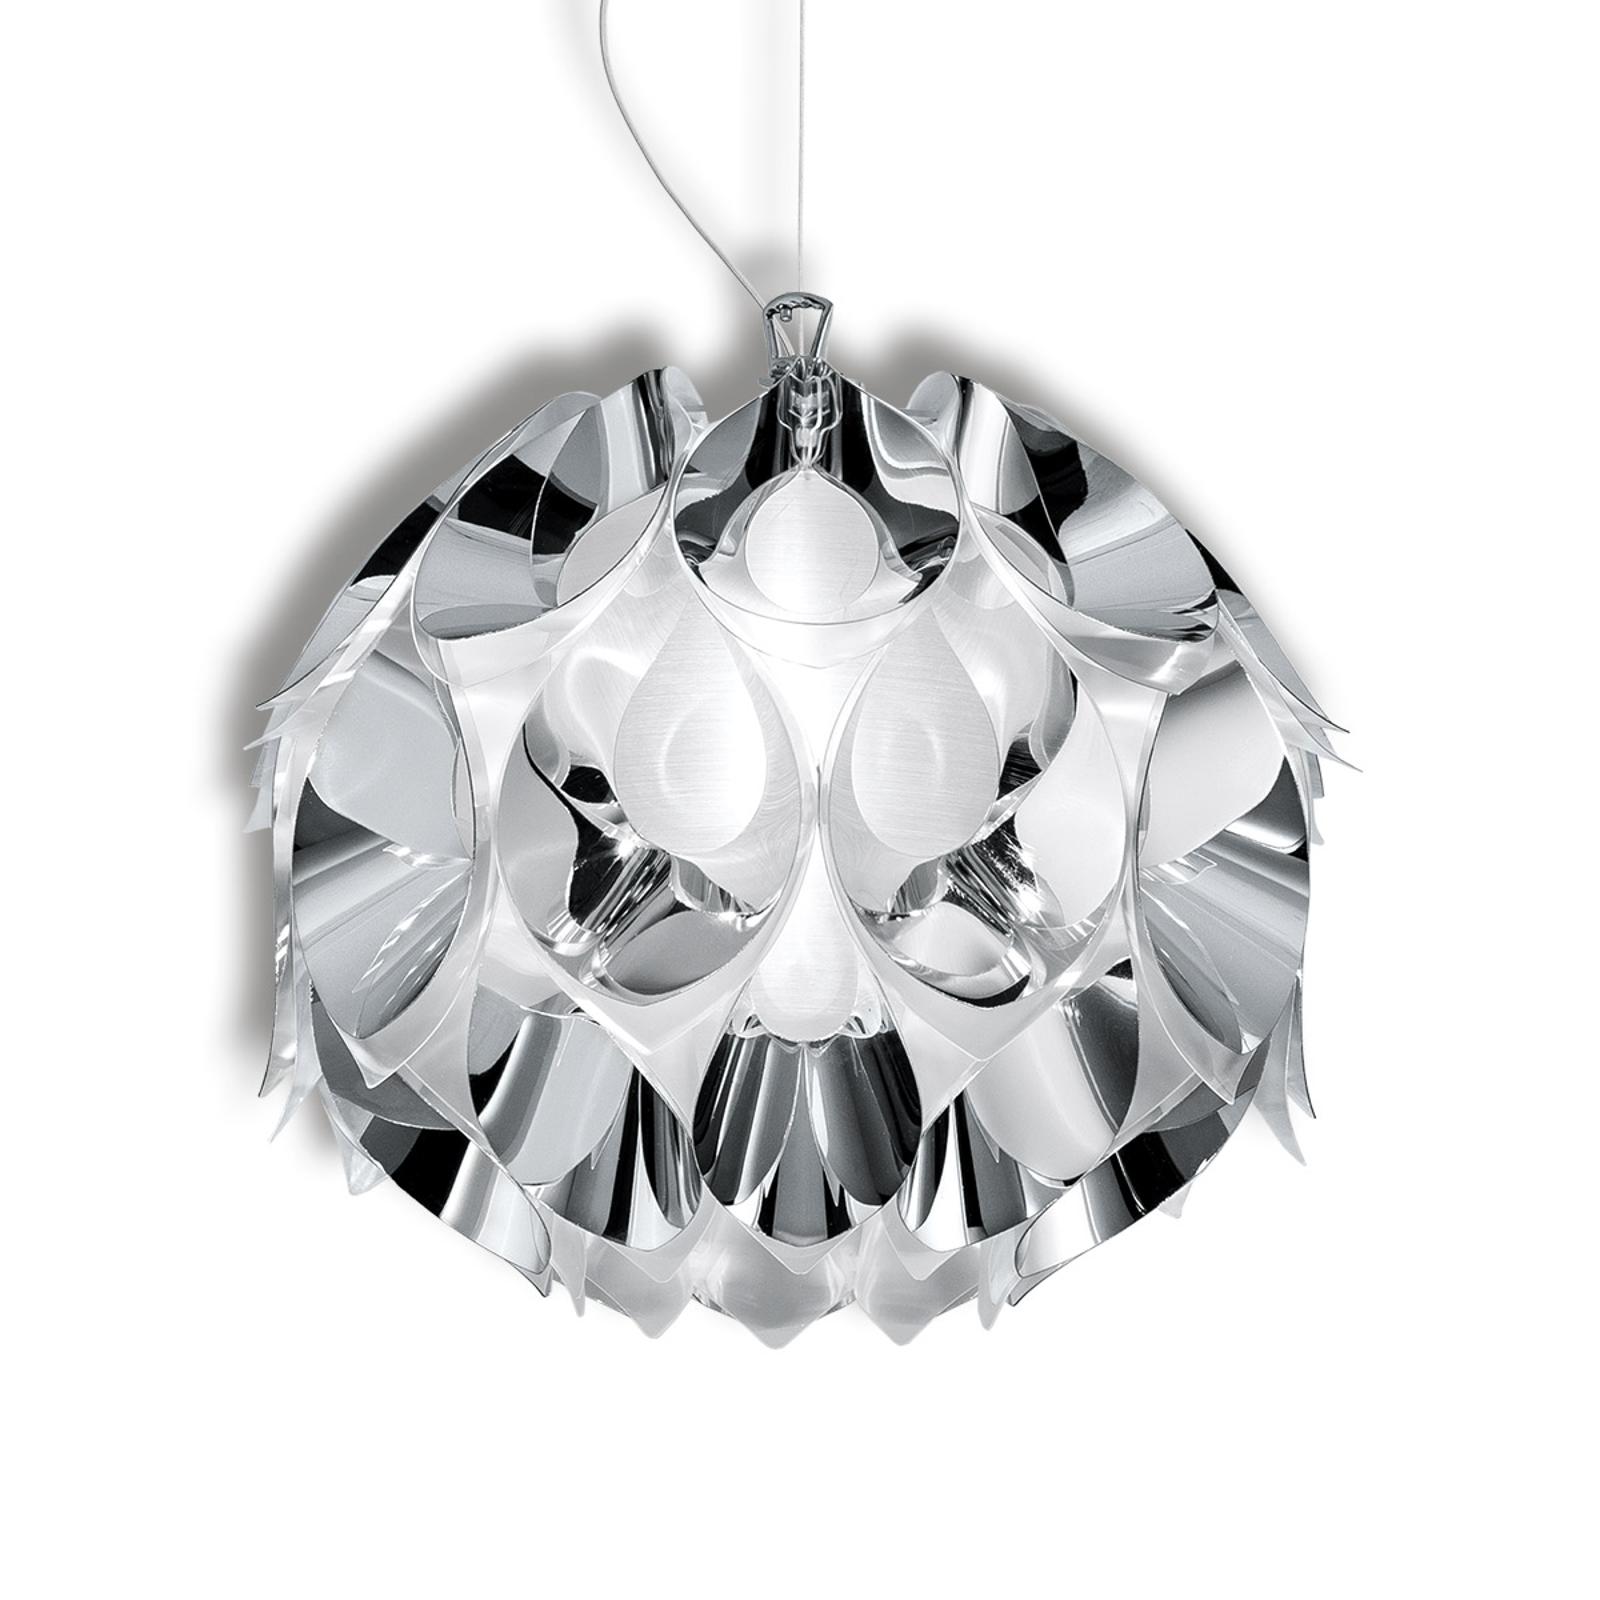 Czarująca lampa wisząca FLORA, srebrna, 36 cm